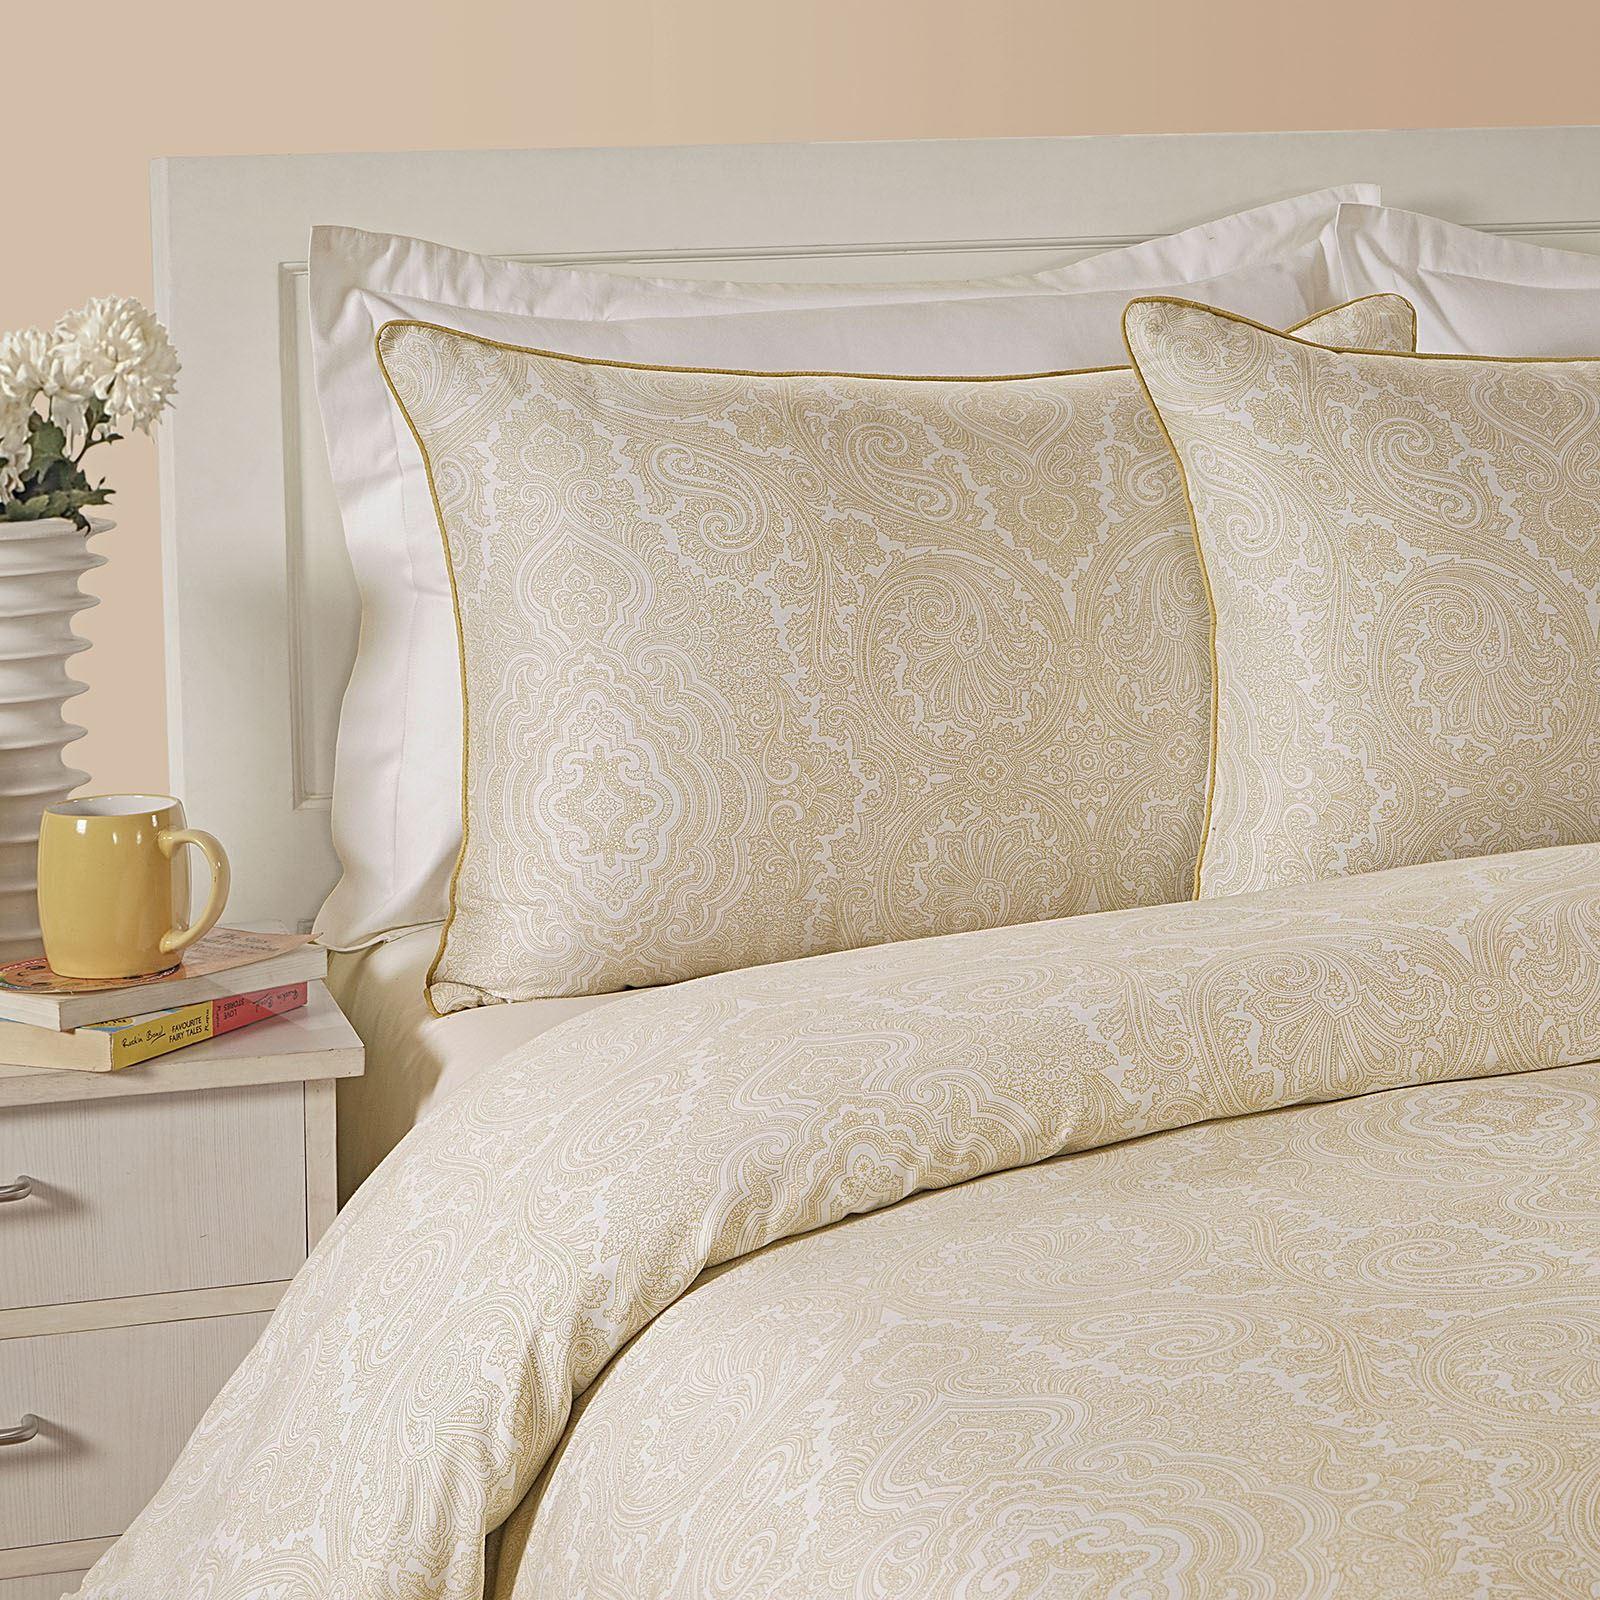 400tc Luxury Cotton Rich Paisley Printed Duvet Cover